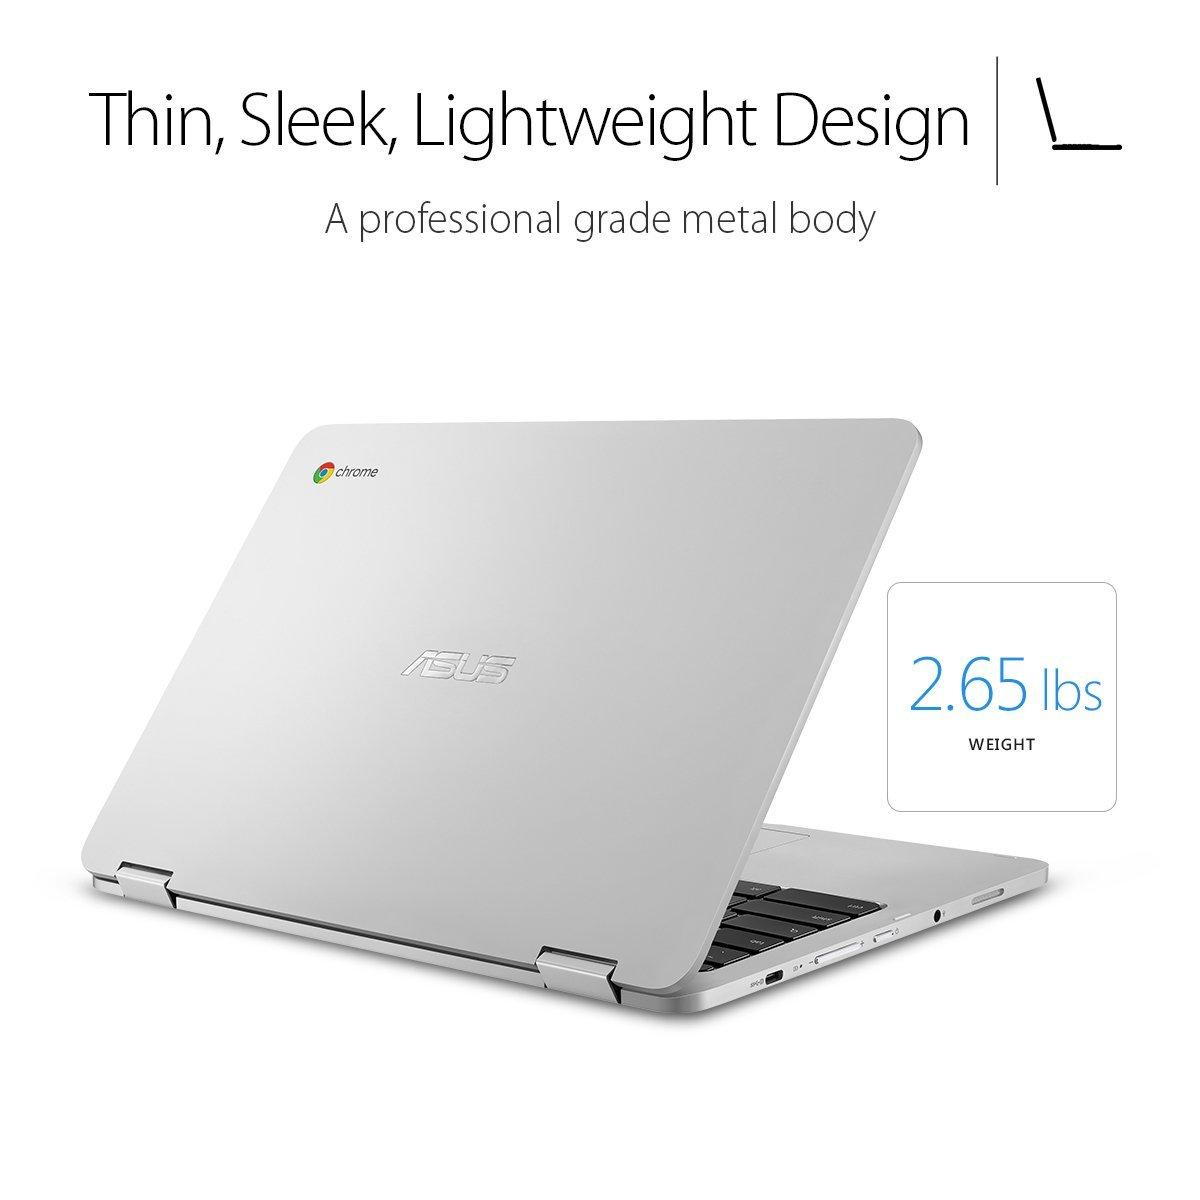 ASUS Chromebook Flip C302CA-DH54 12.5 touchscreen